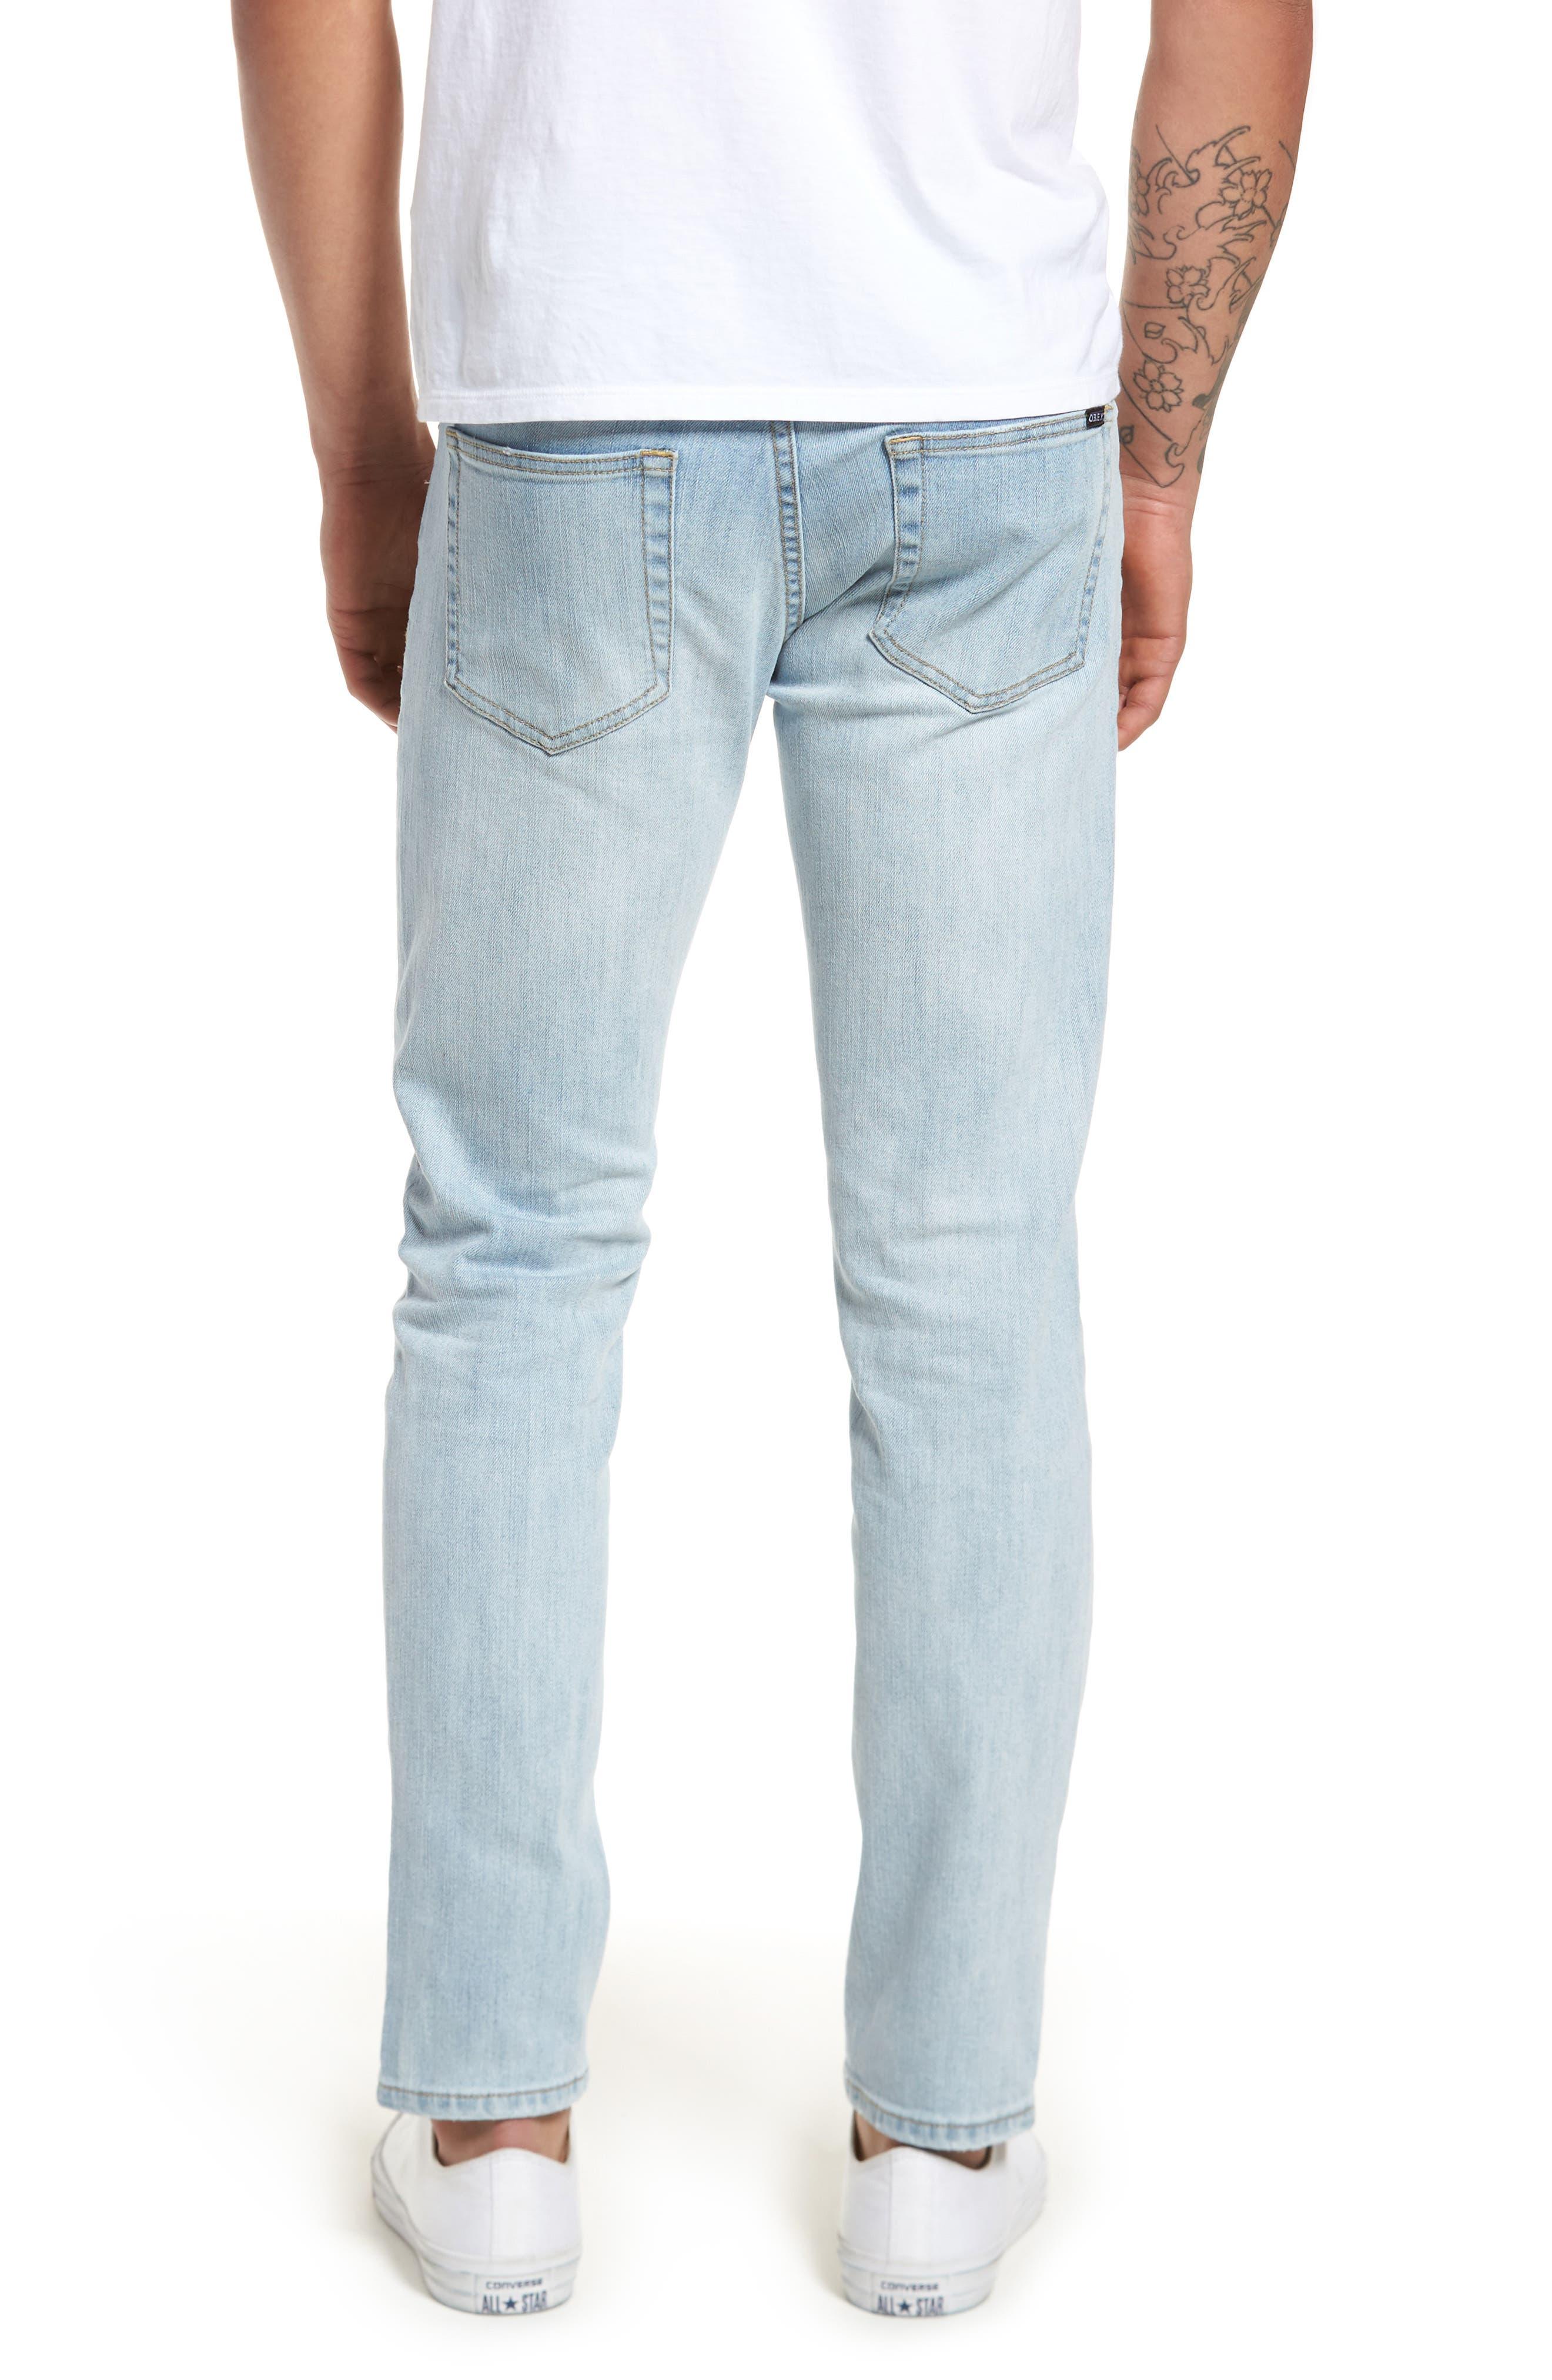 Juvee II Skinny Fit Jeans,                             Alternate thumbnail 2, color,                             400